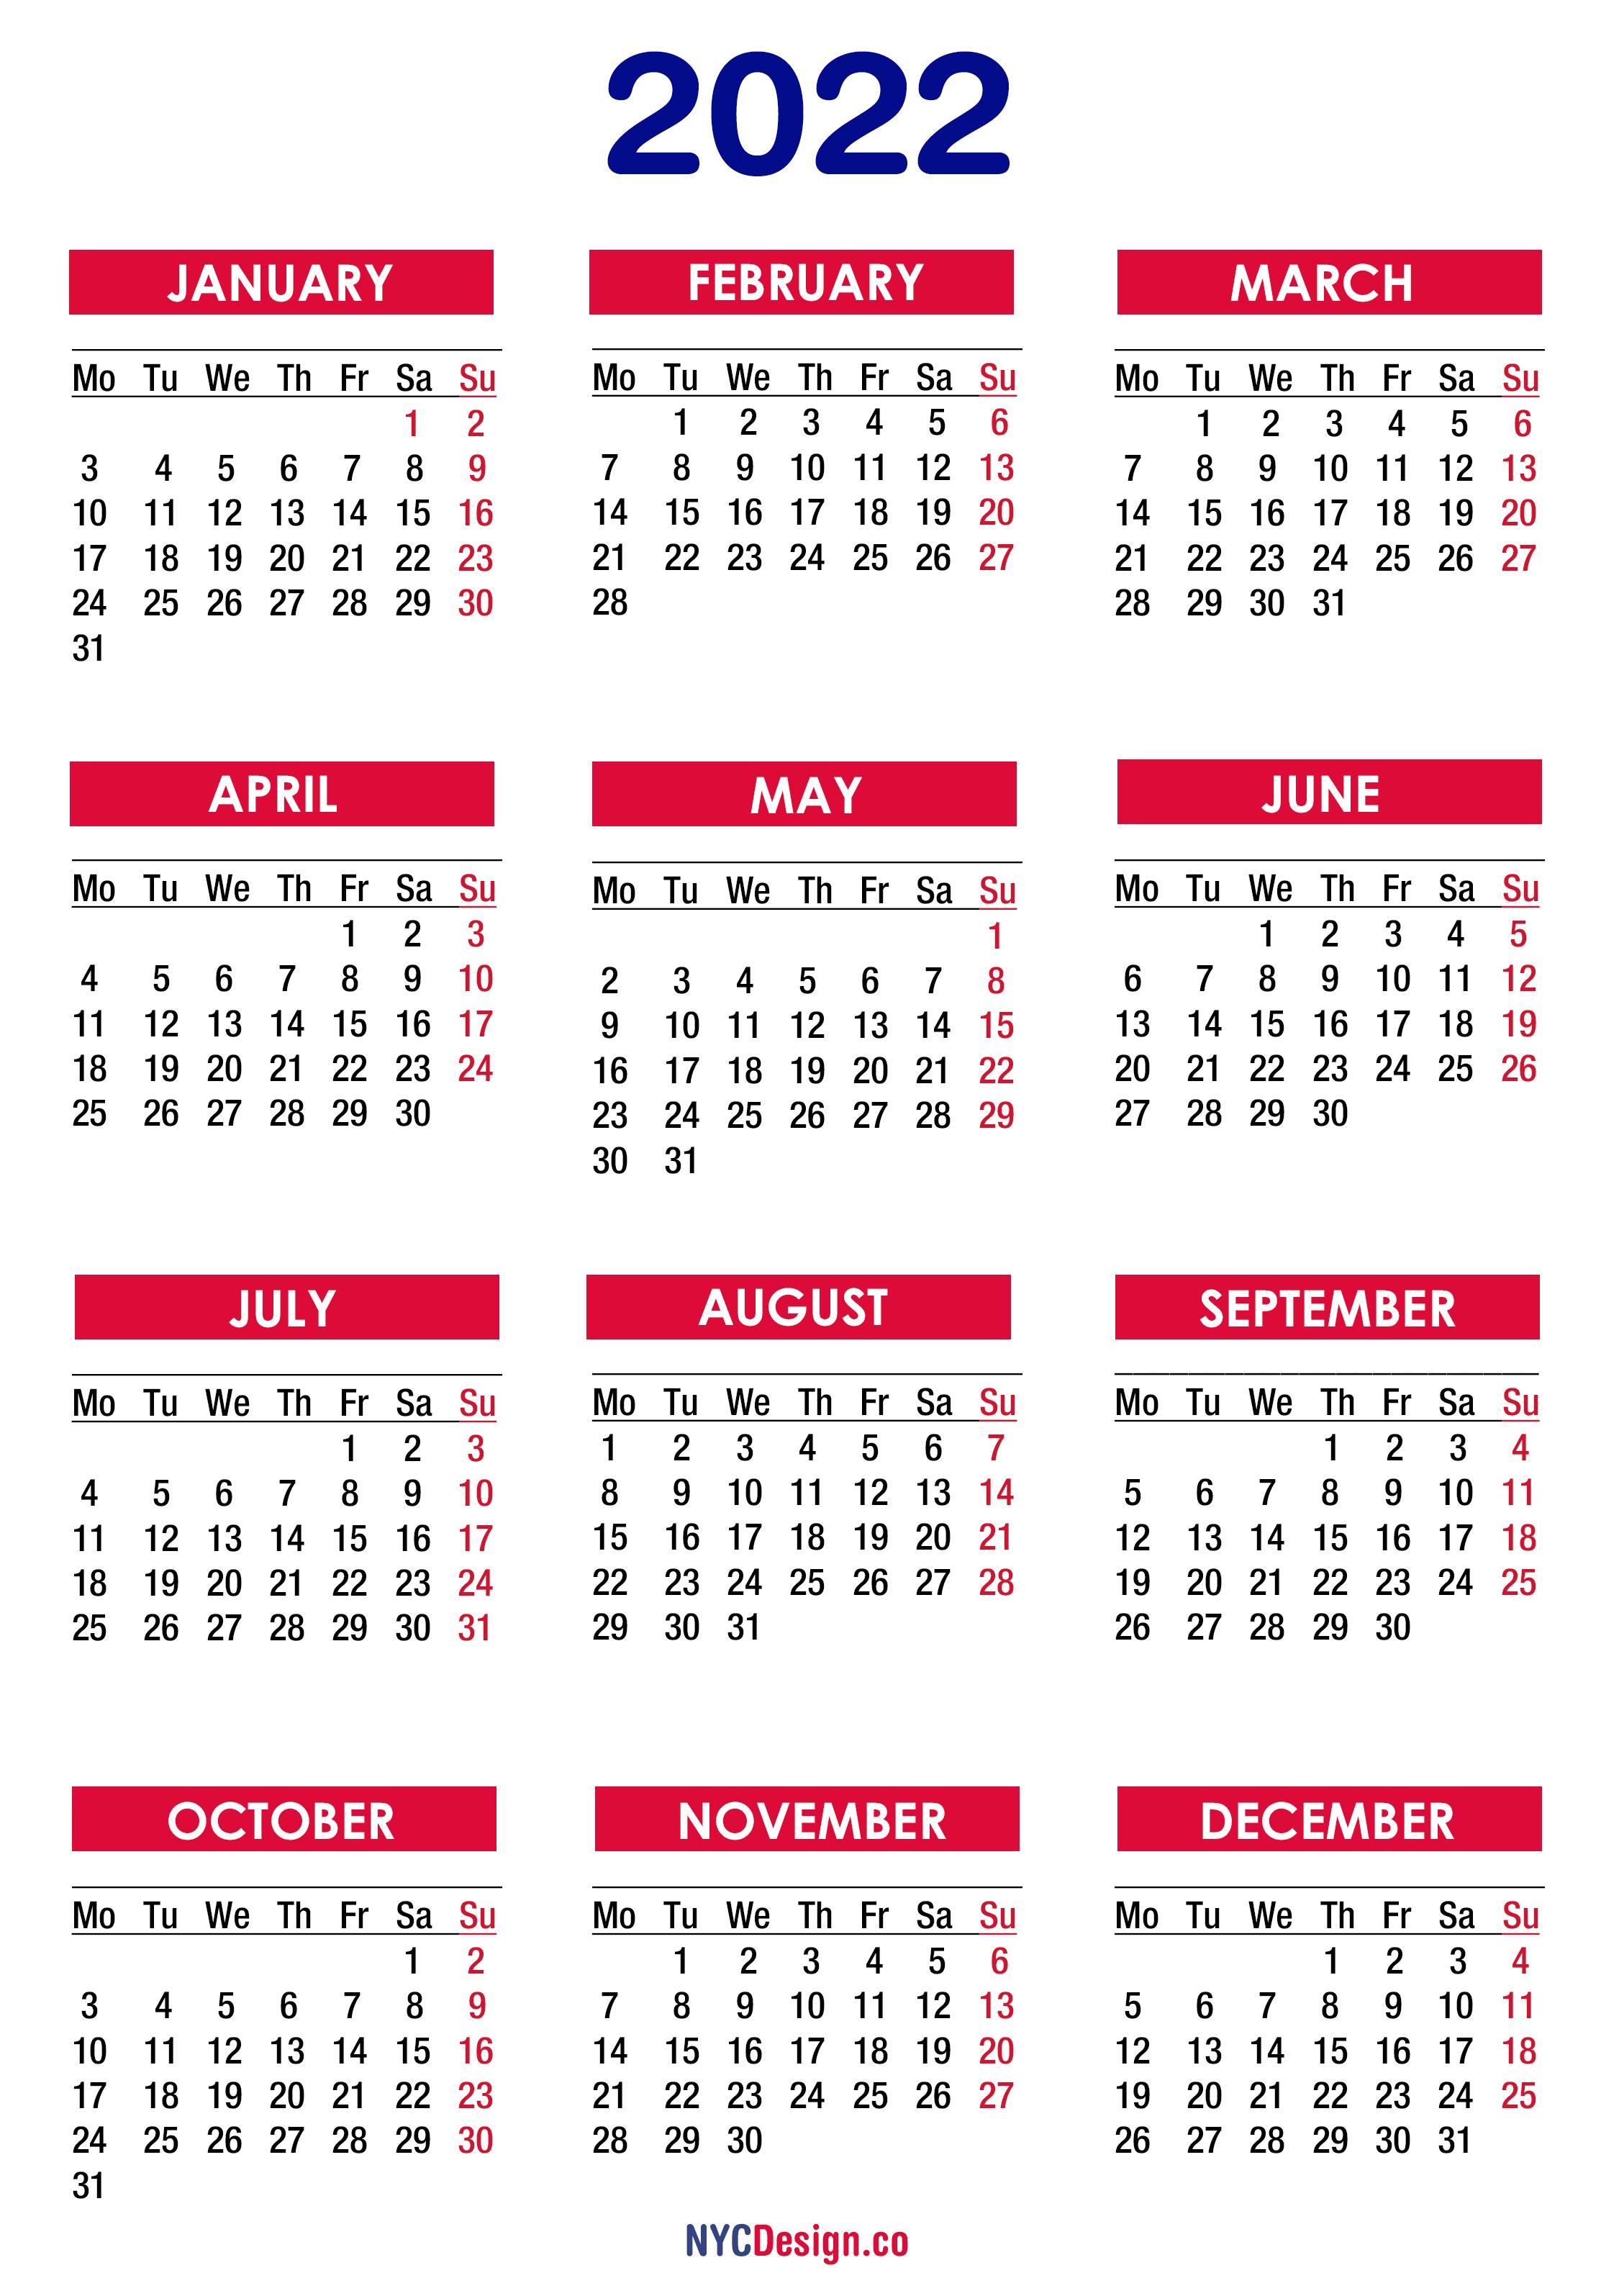 2022 Calendar Printable Free, PDF, Colorful - Monday Start ...